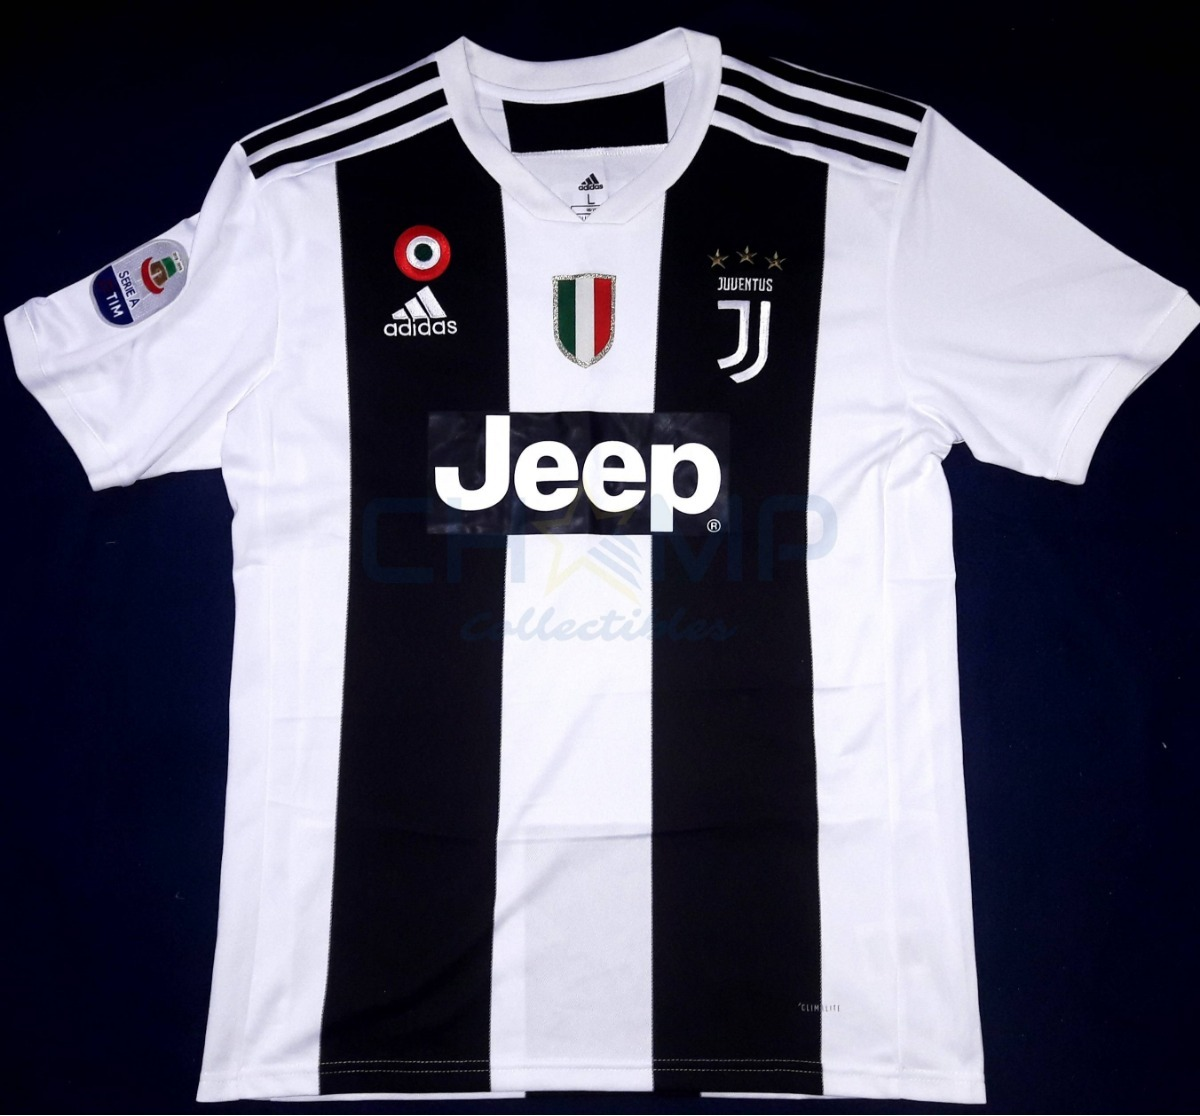 best website 36c07 6f704 Jersey Firmado Paulo Dybala Juventus 2018-19 Juve Autografo